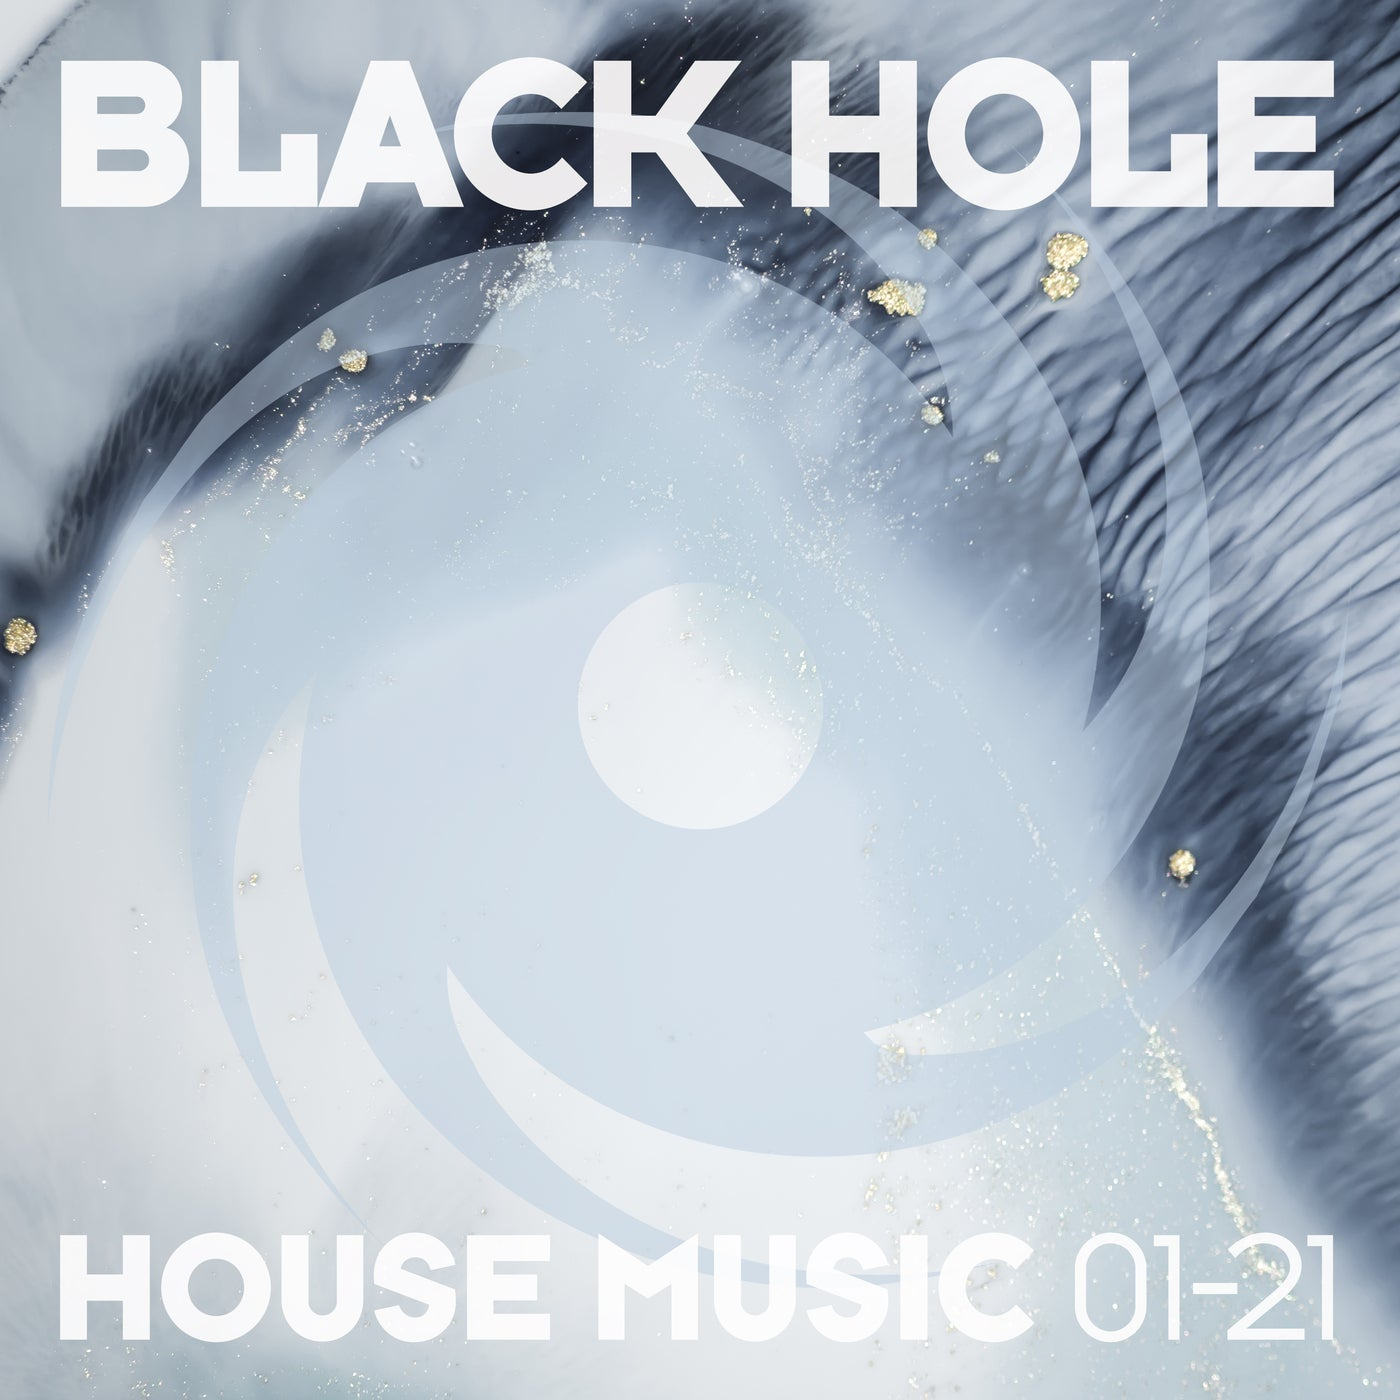 Black Hole House Music 01-21